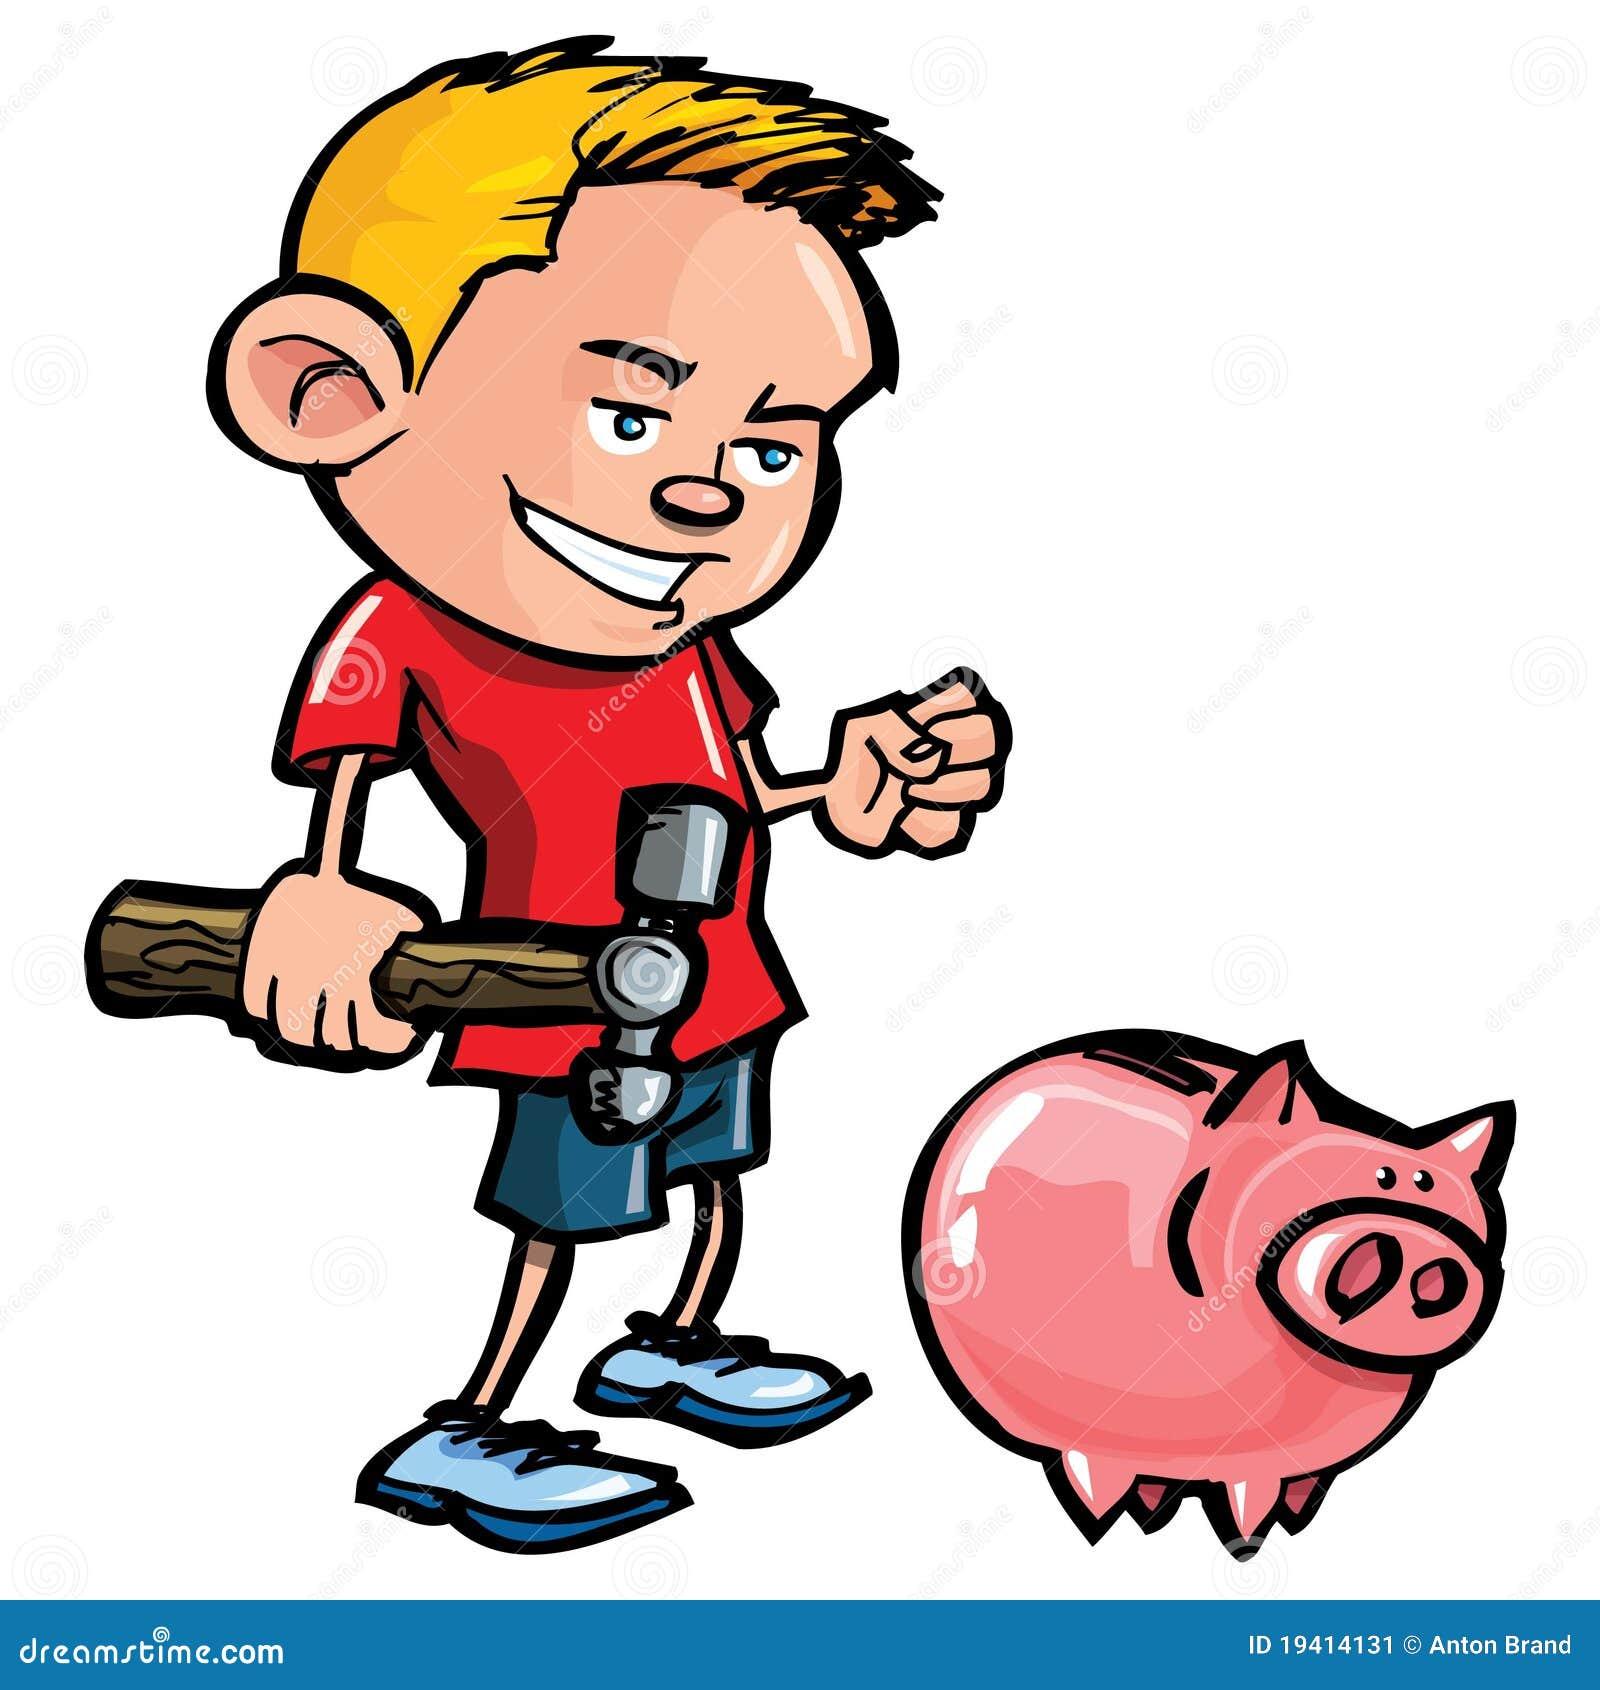 Cartoon Boy With A Piggy Bank Stock Image - Image: 19414131